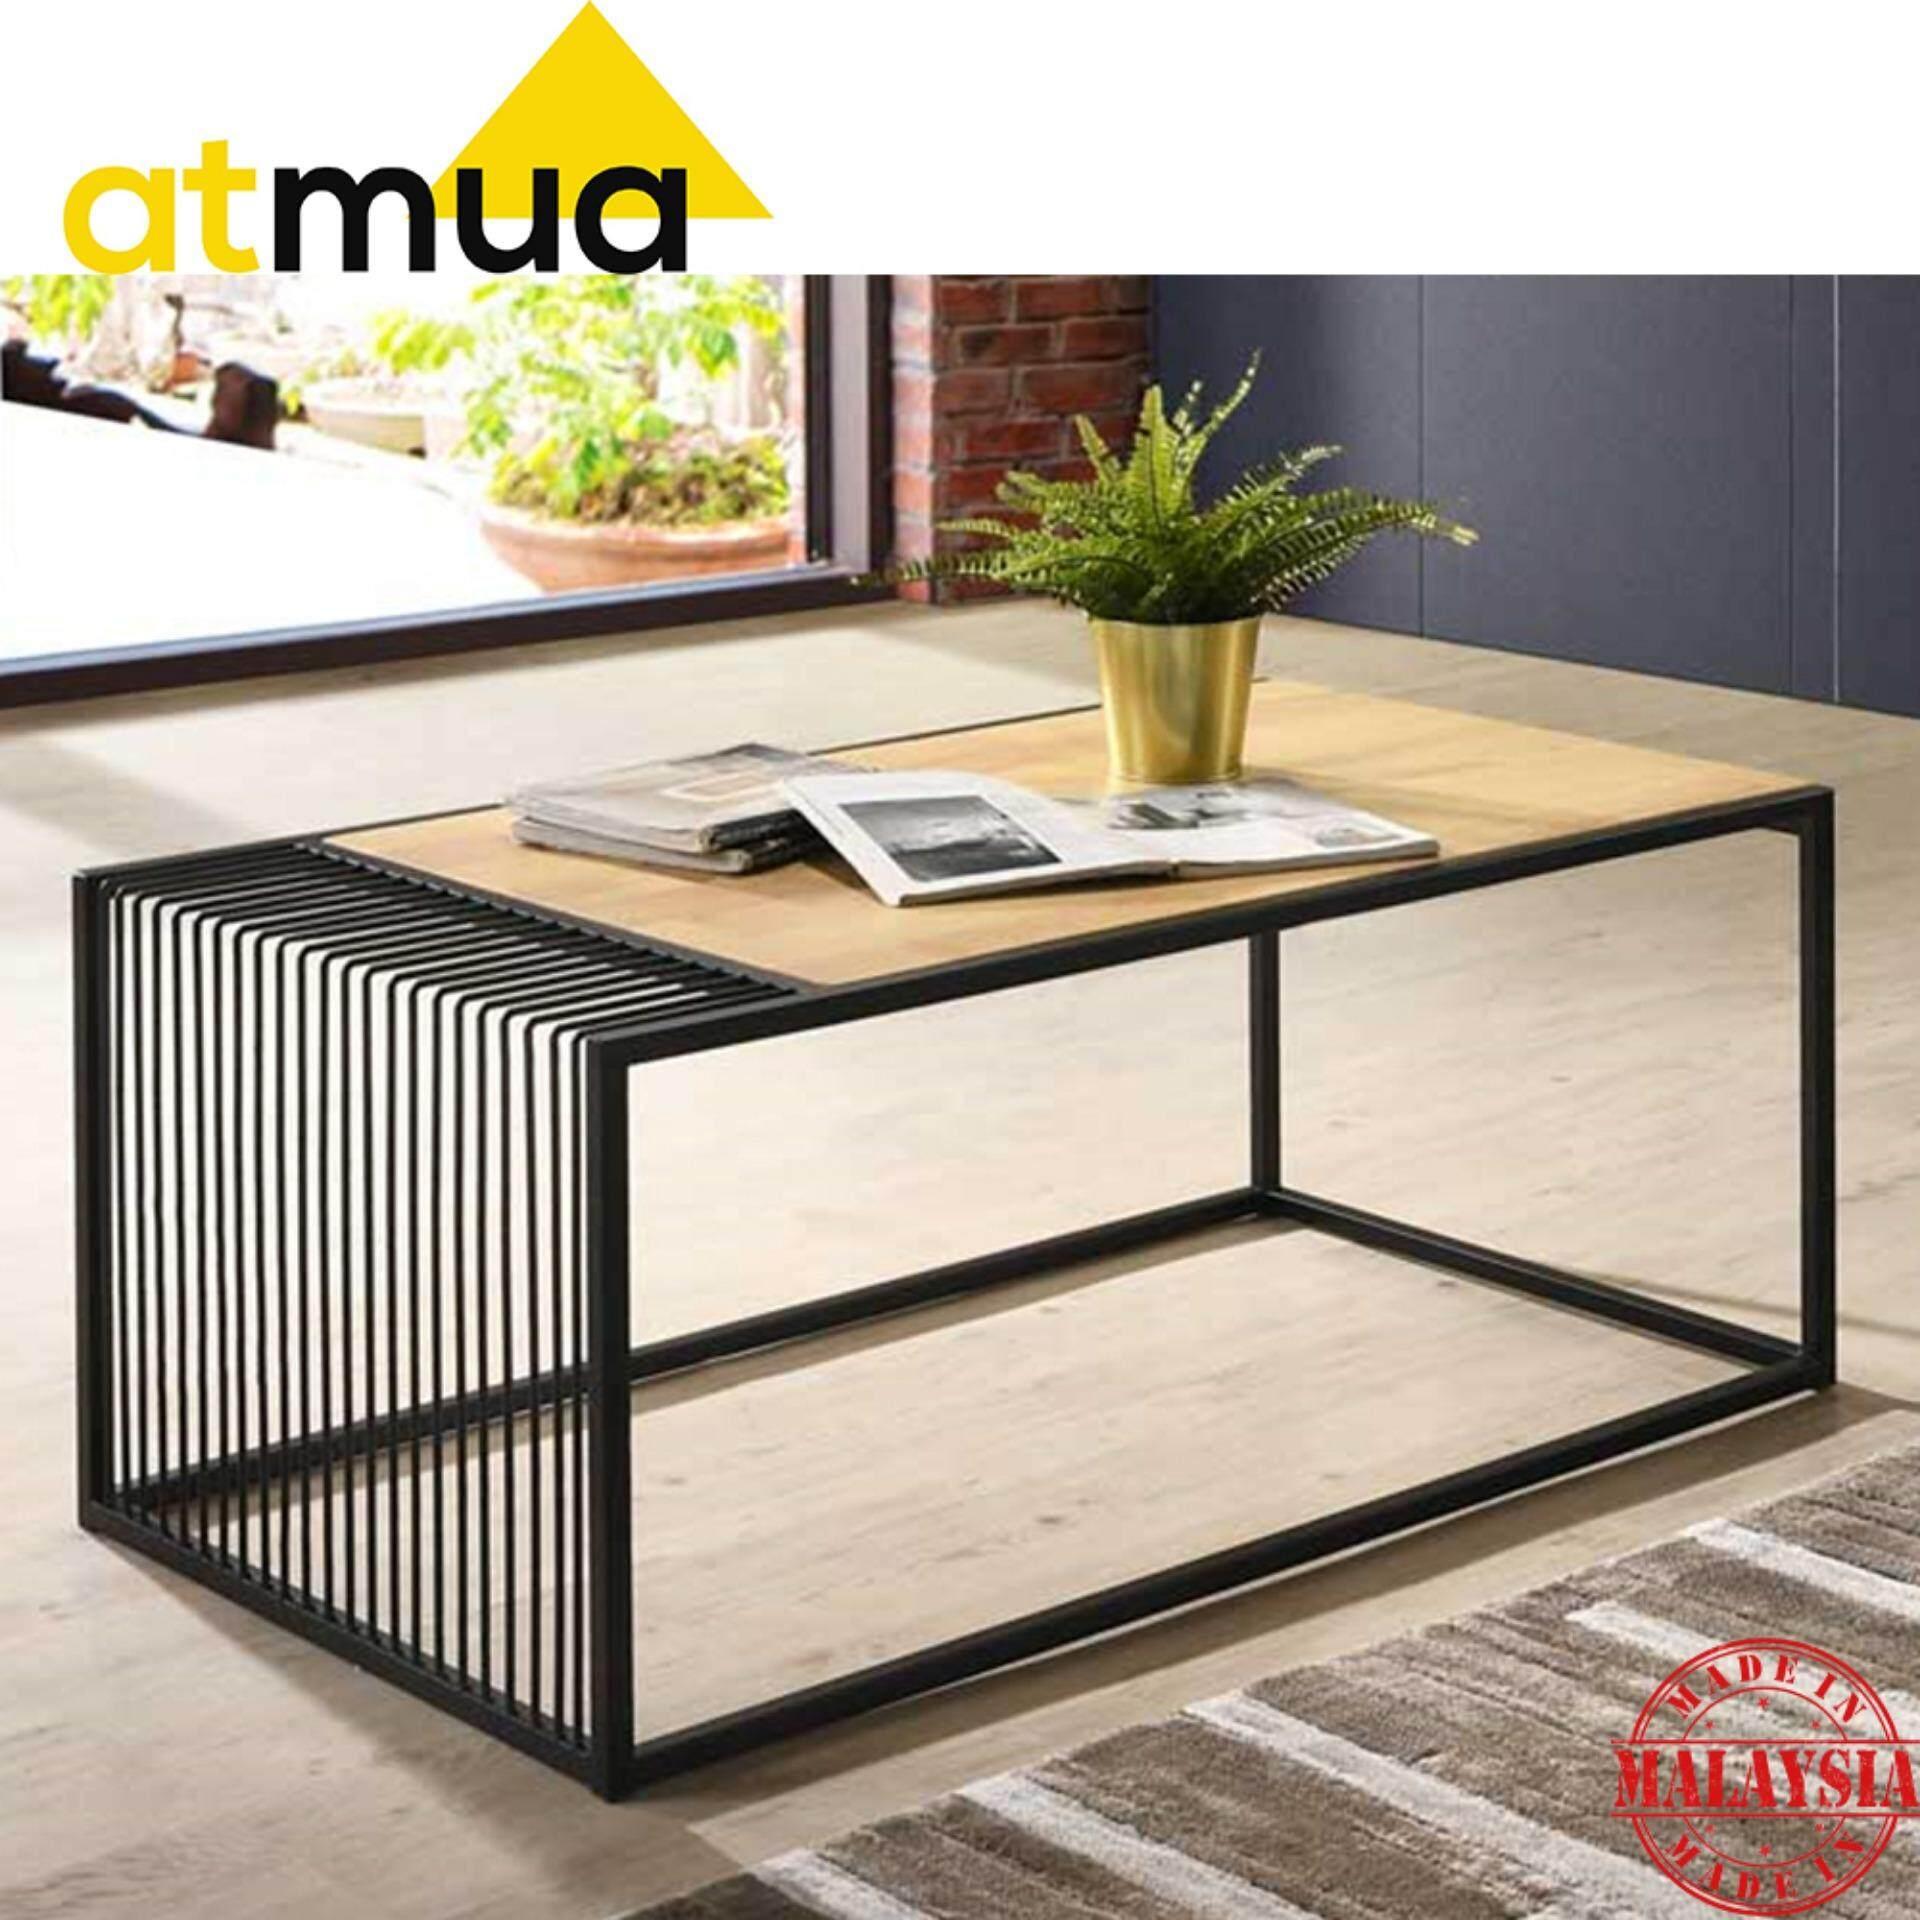 Atmua Wander Coffee Table LOFT Design [Rubber Wood Top with Metal Leg]